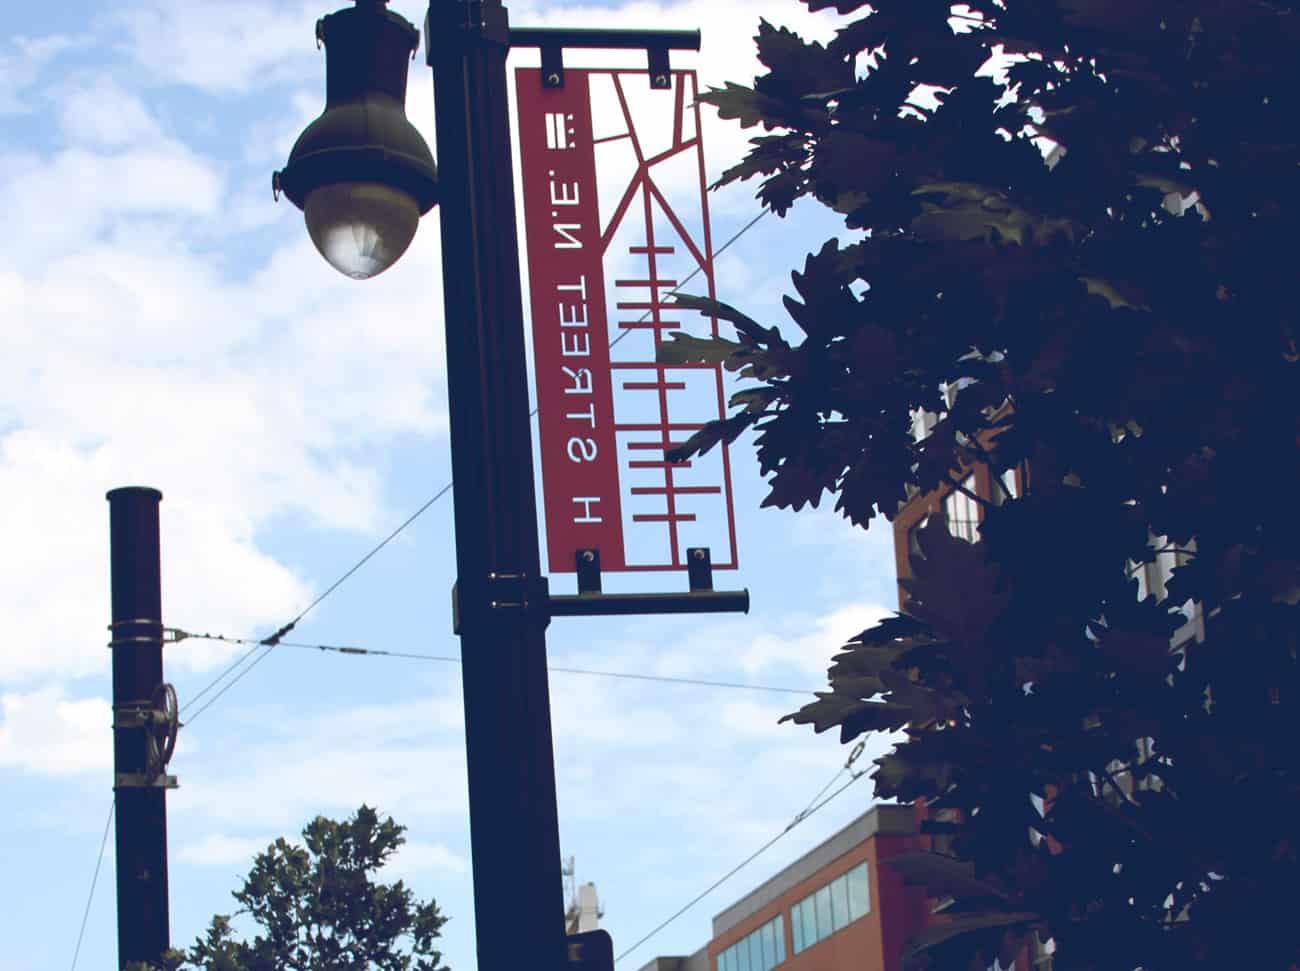 H Street sign